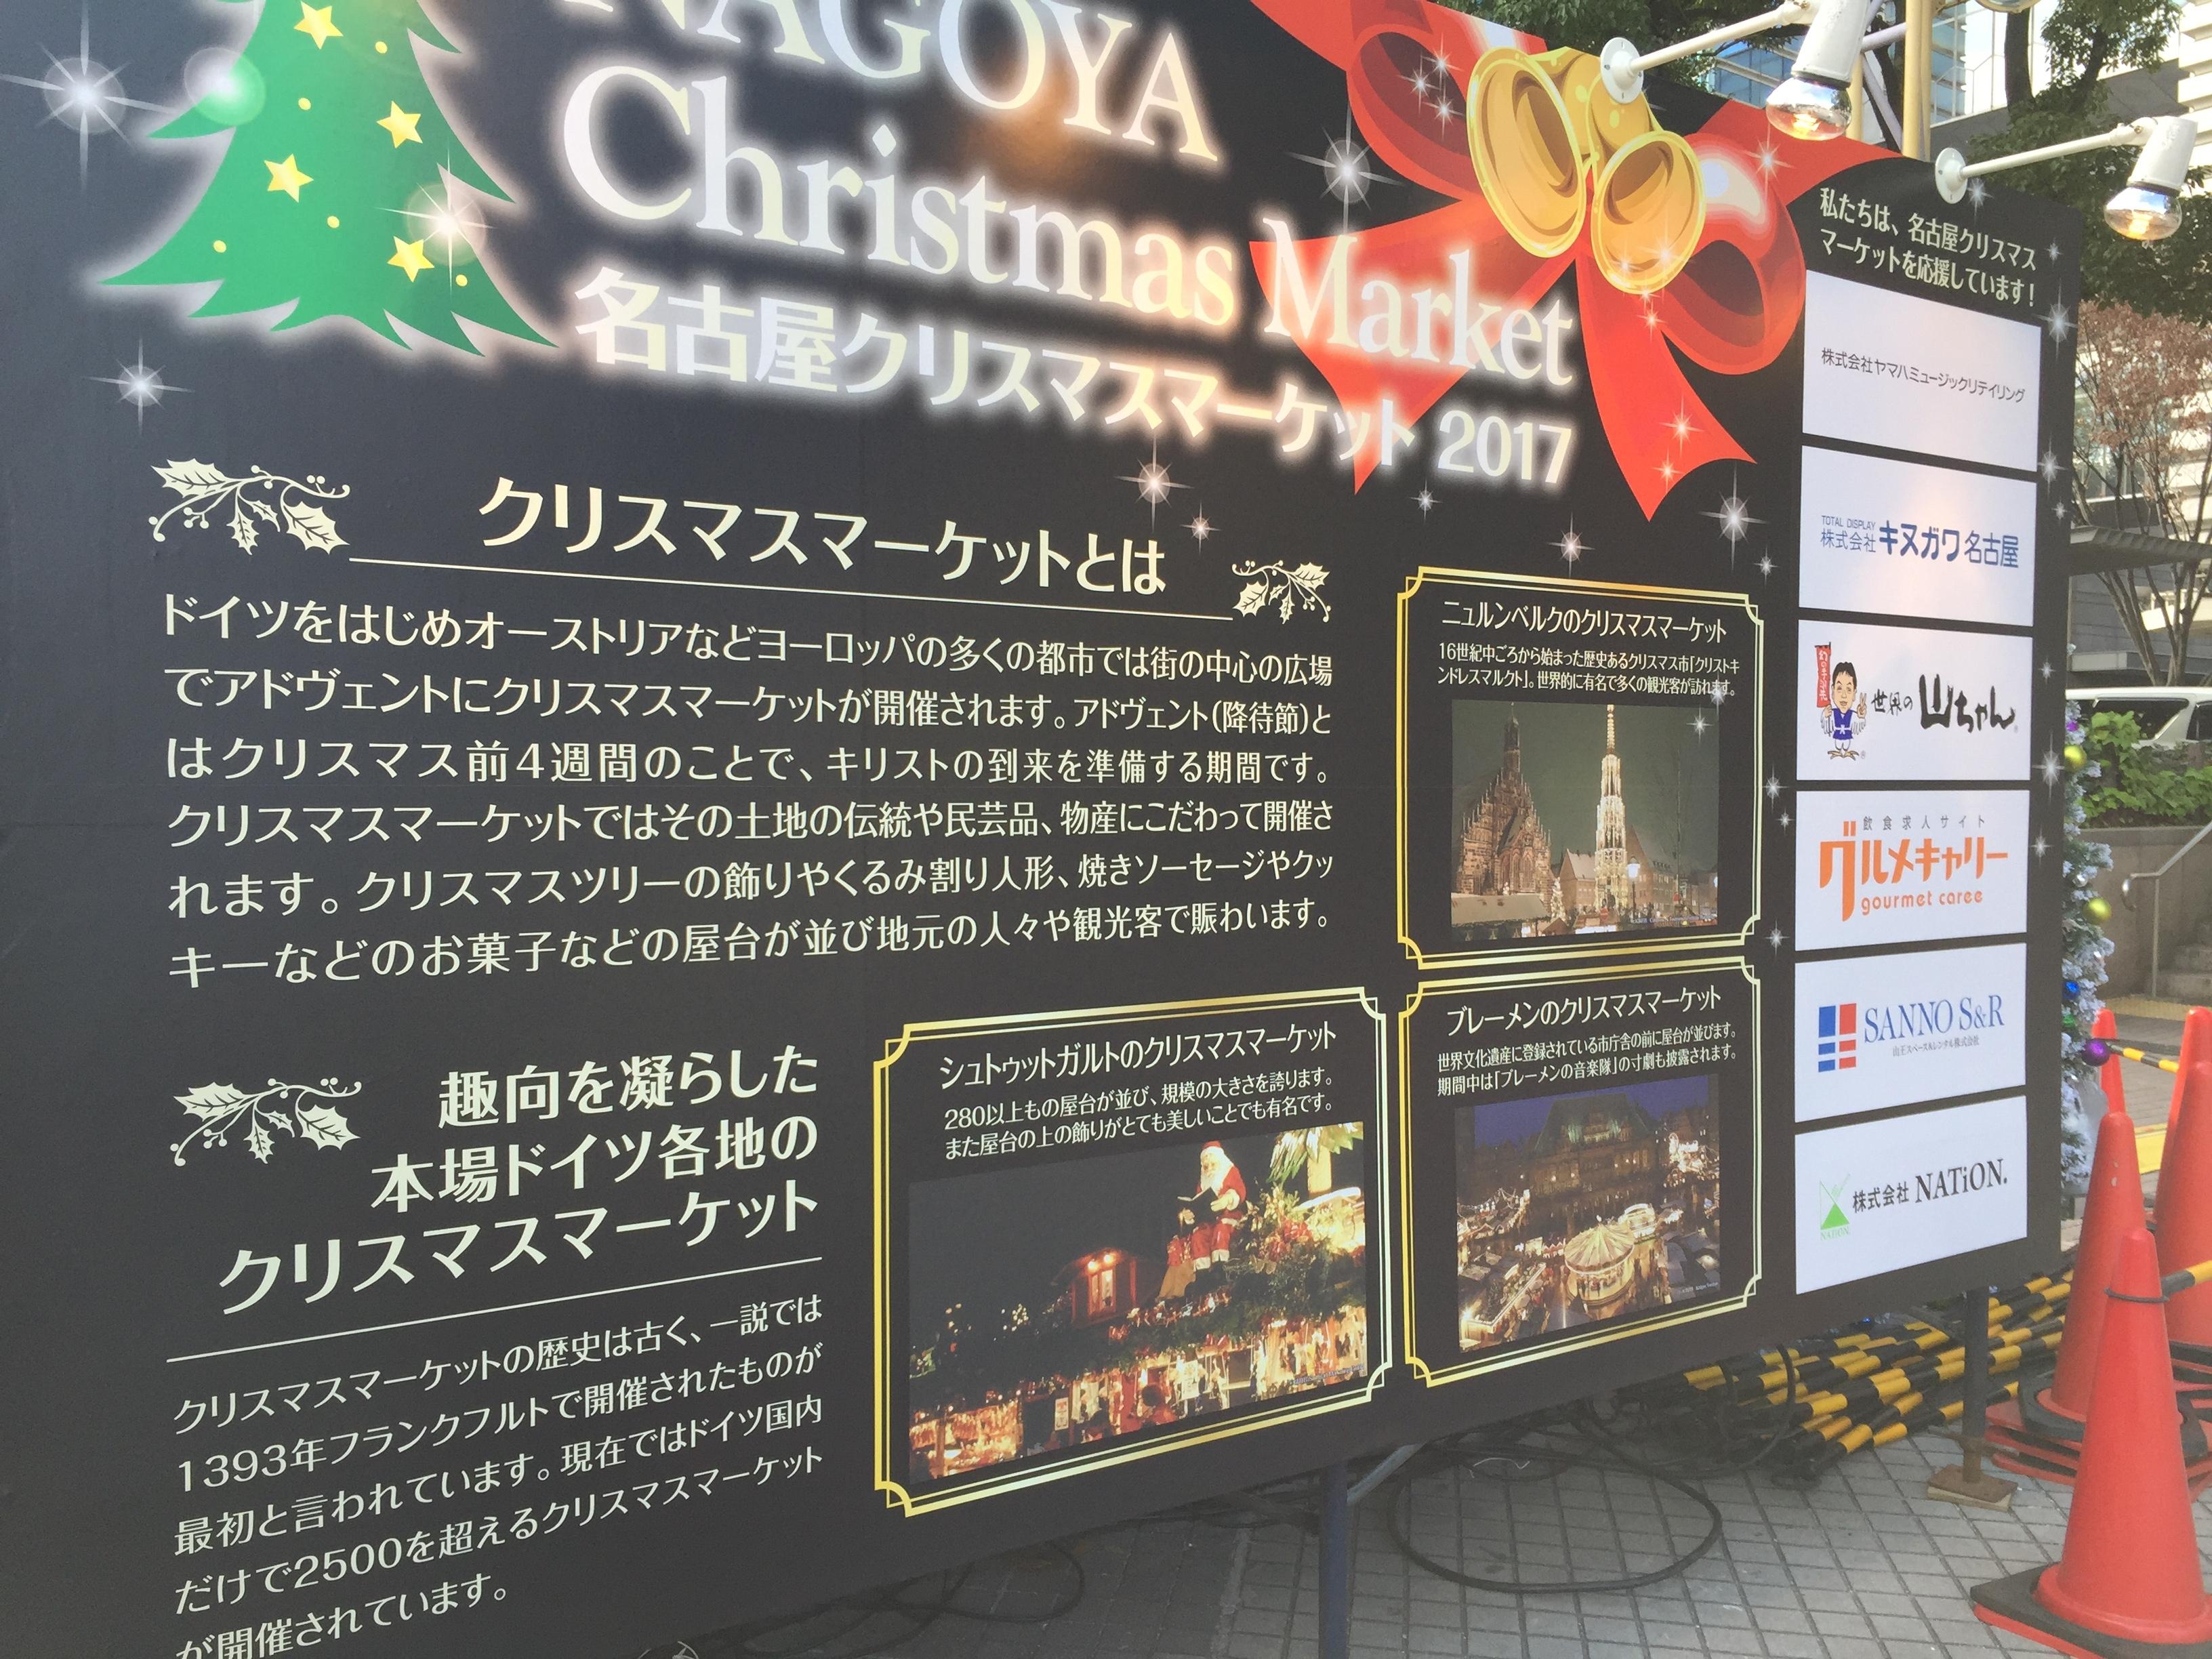 nagoya-christmas-market